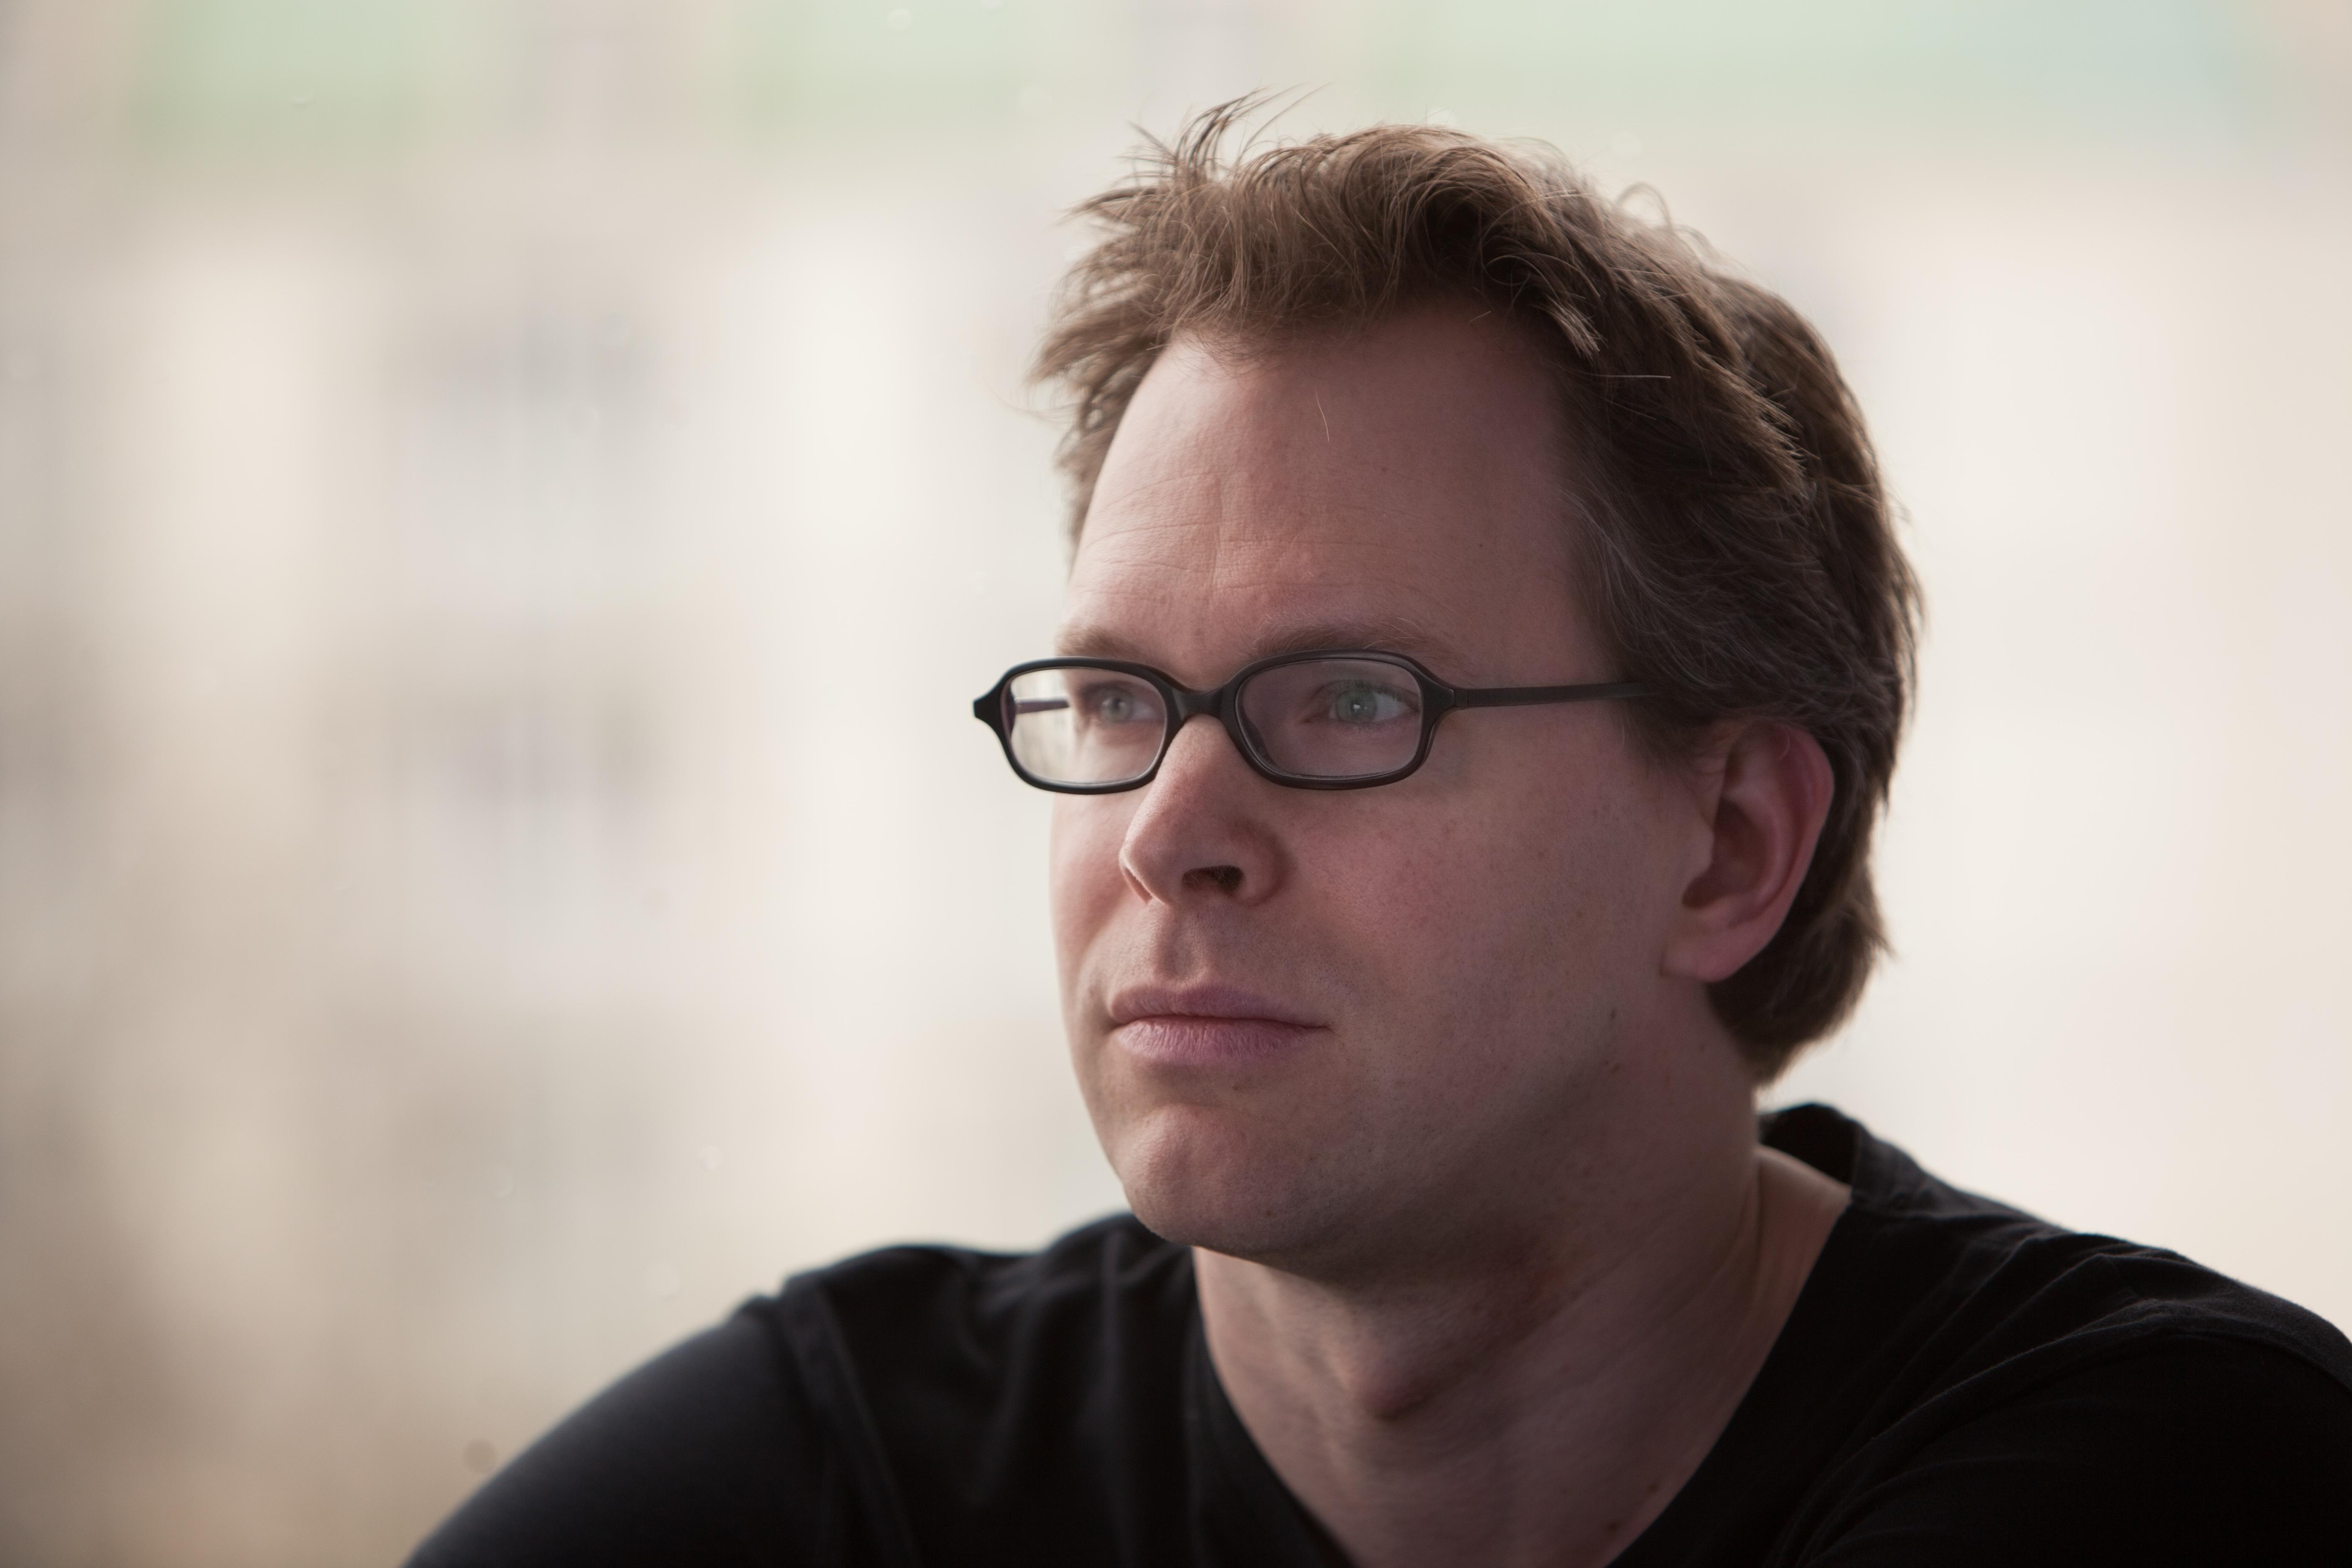 Daniel Giglberger, credit: Florian Ganslmeier